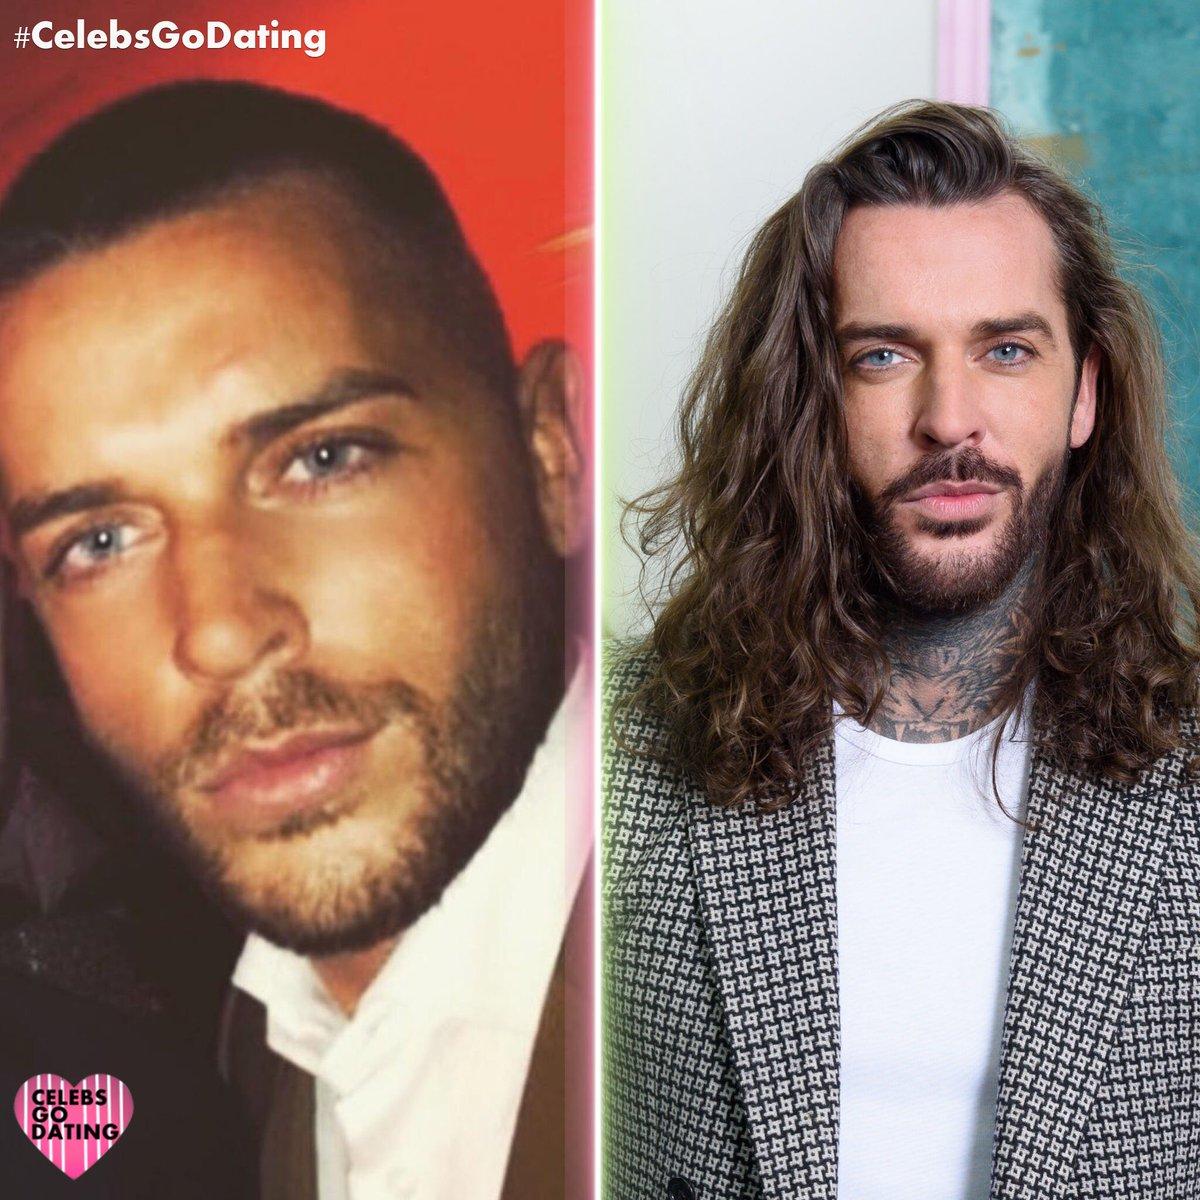 Celebs Go Dating's photo on #PubertyChallenge